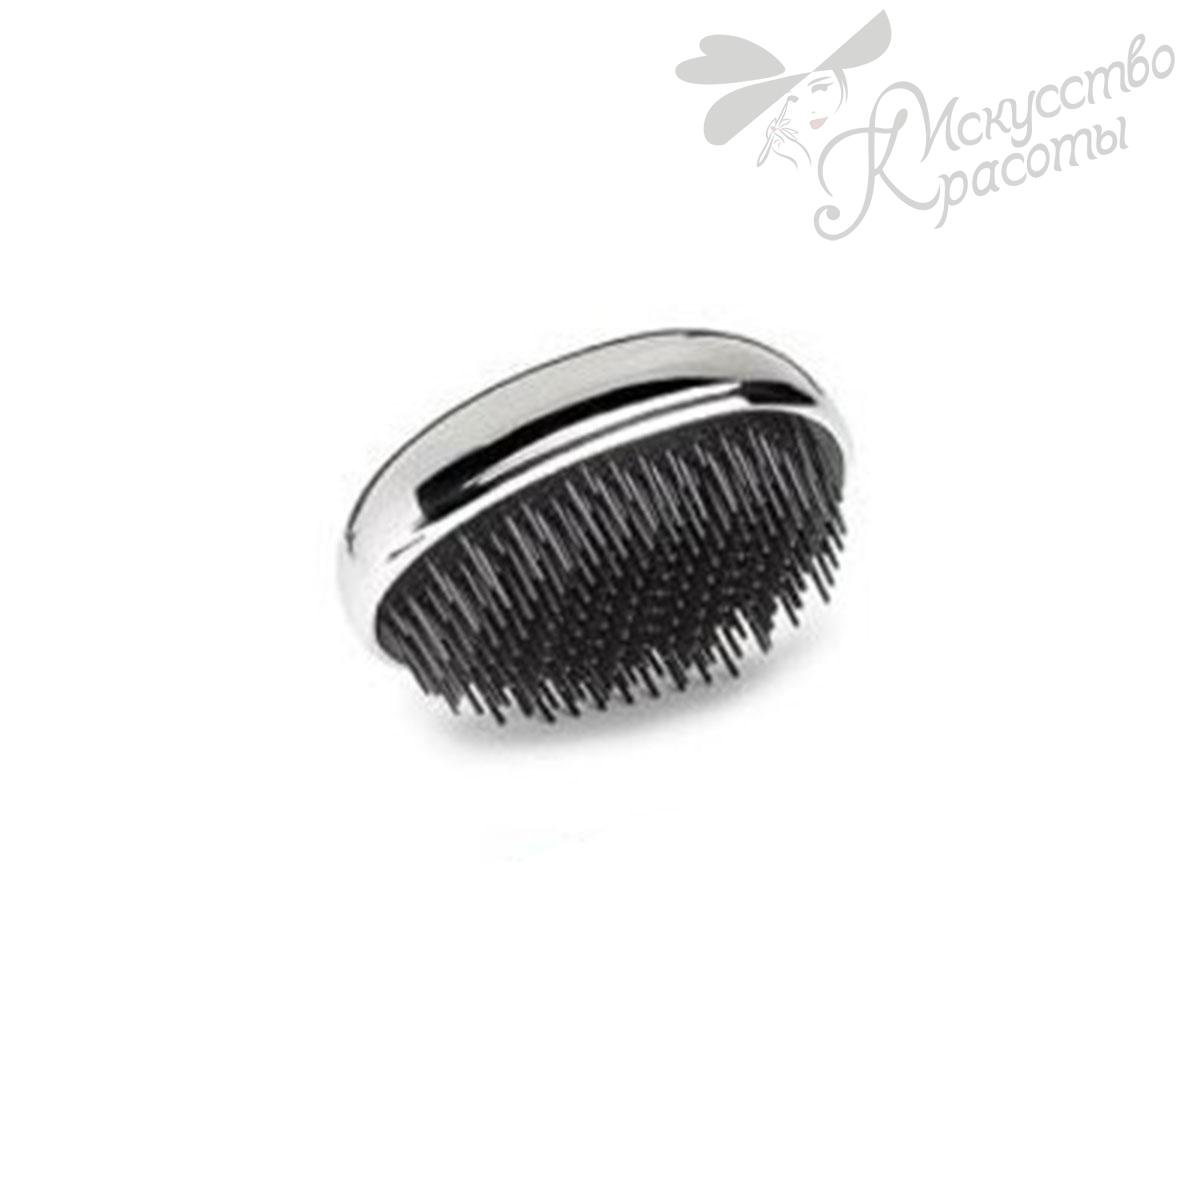 Щетка для волос Silver Miss Butterfly Kiepe